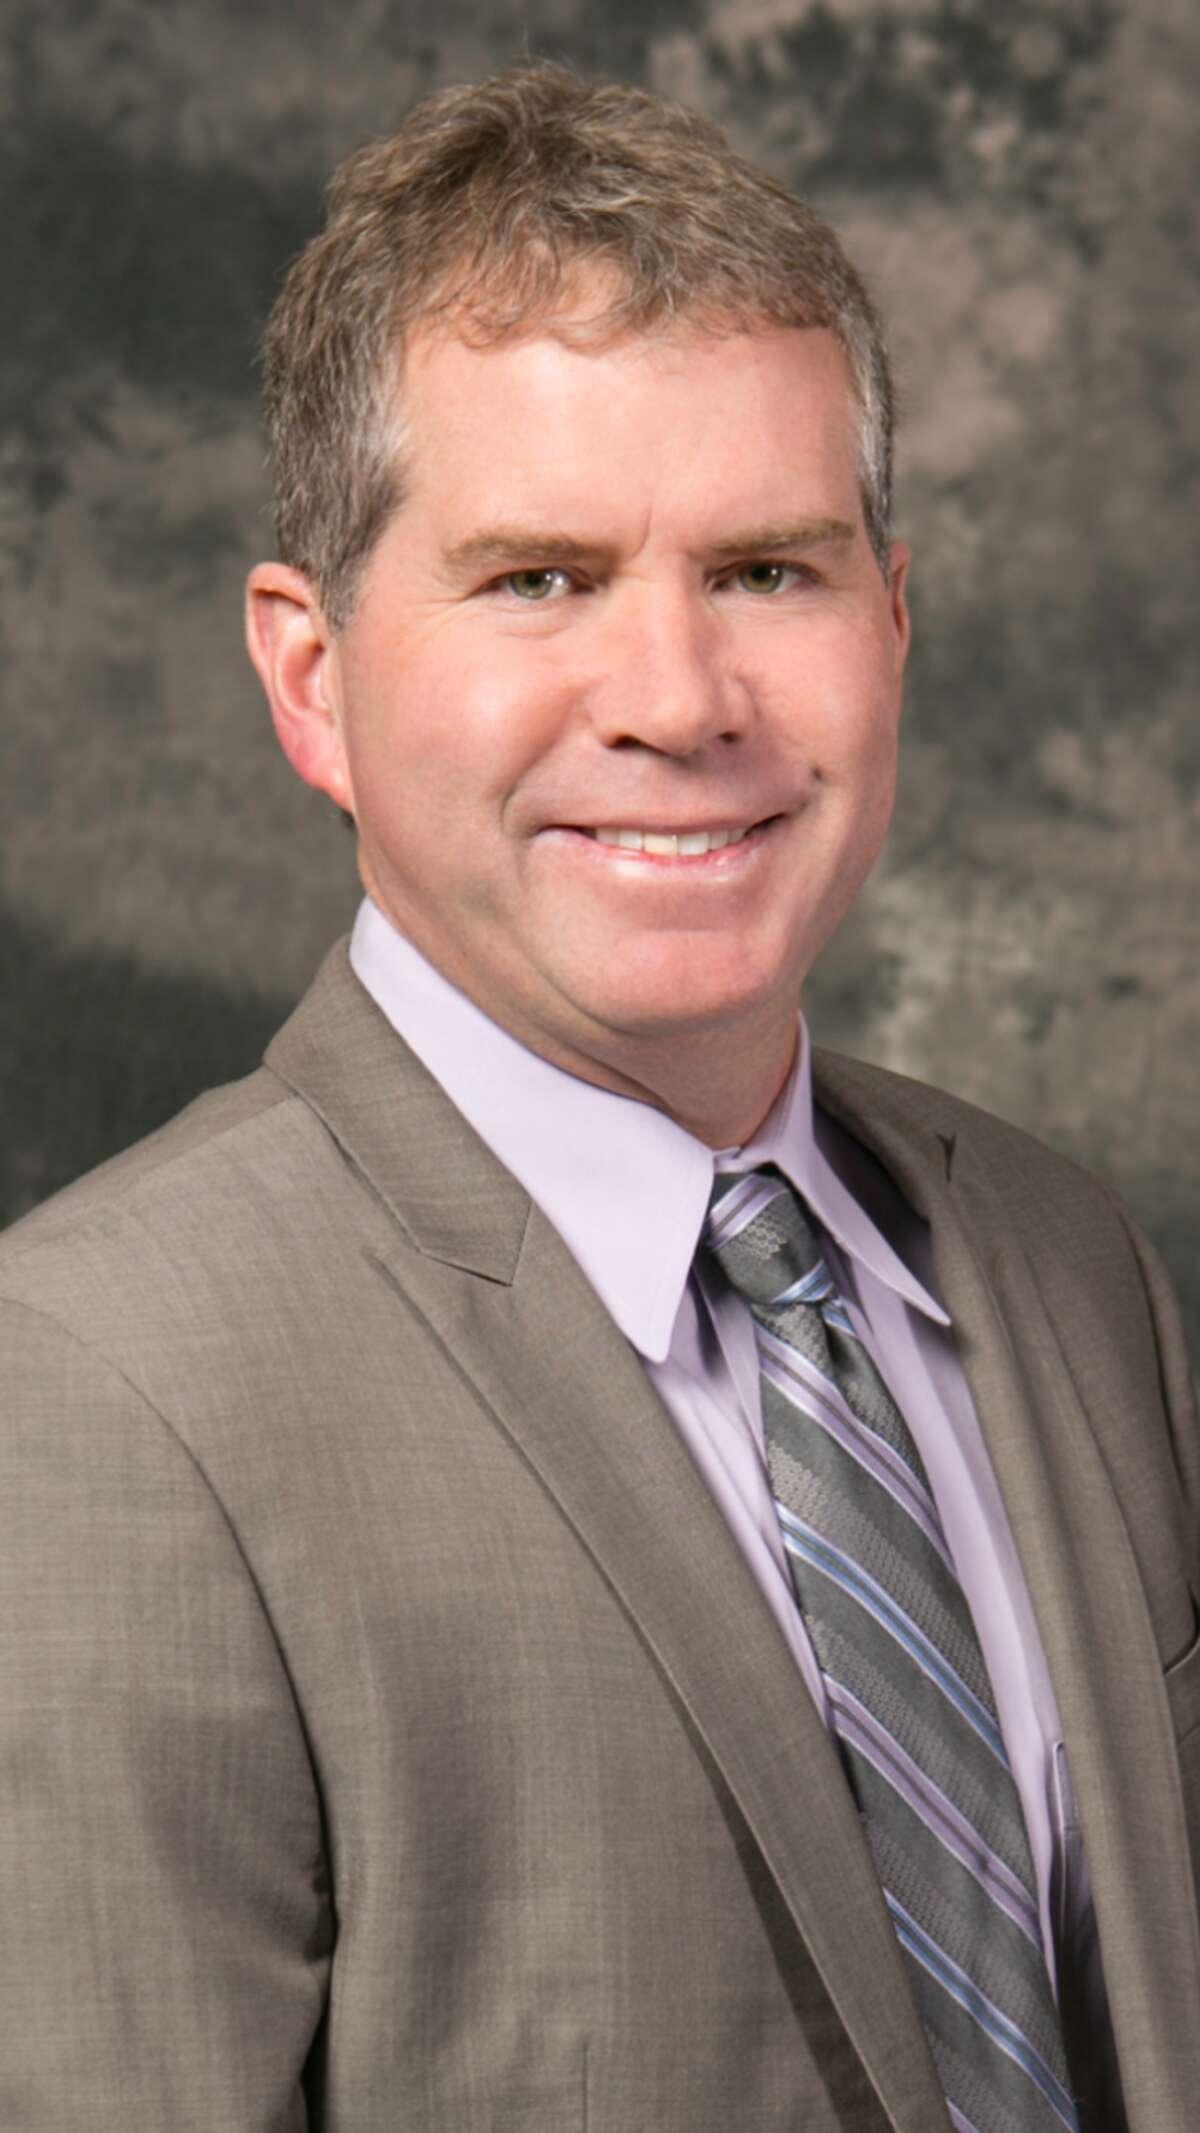 Edwardsville Mayor Hal Patton